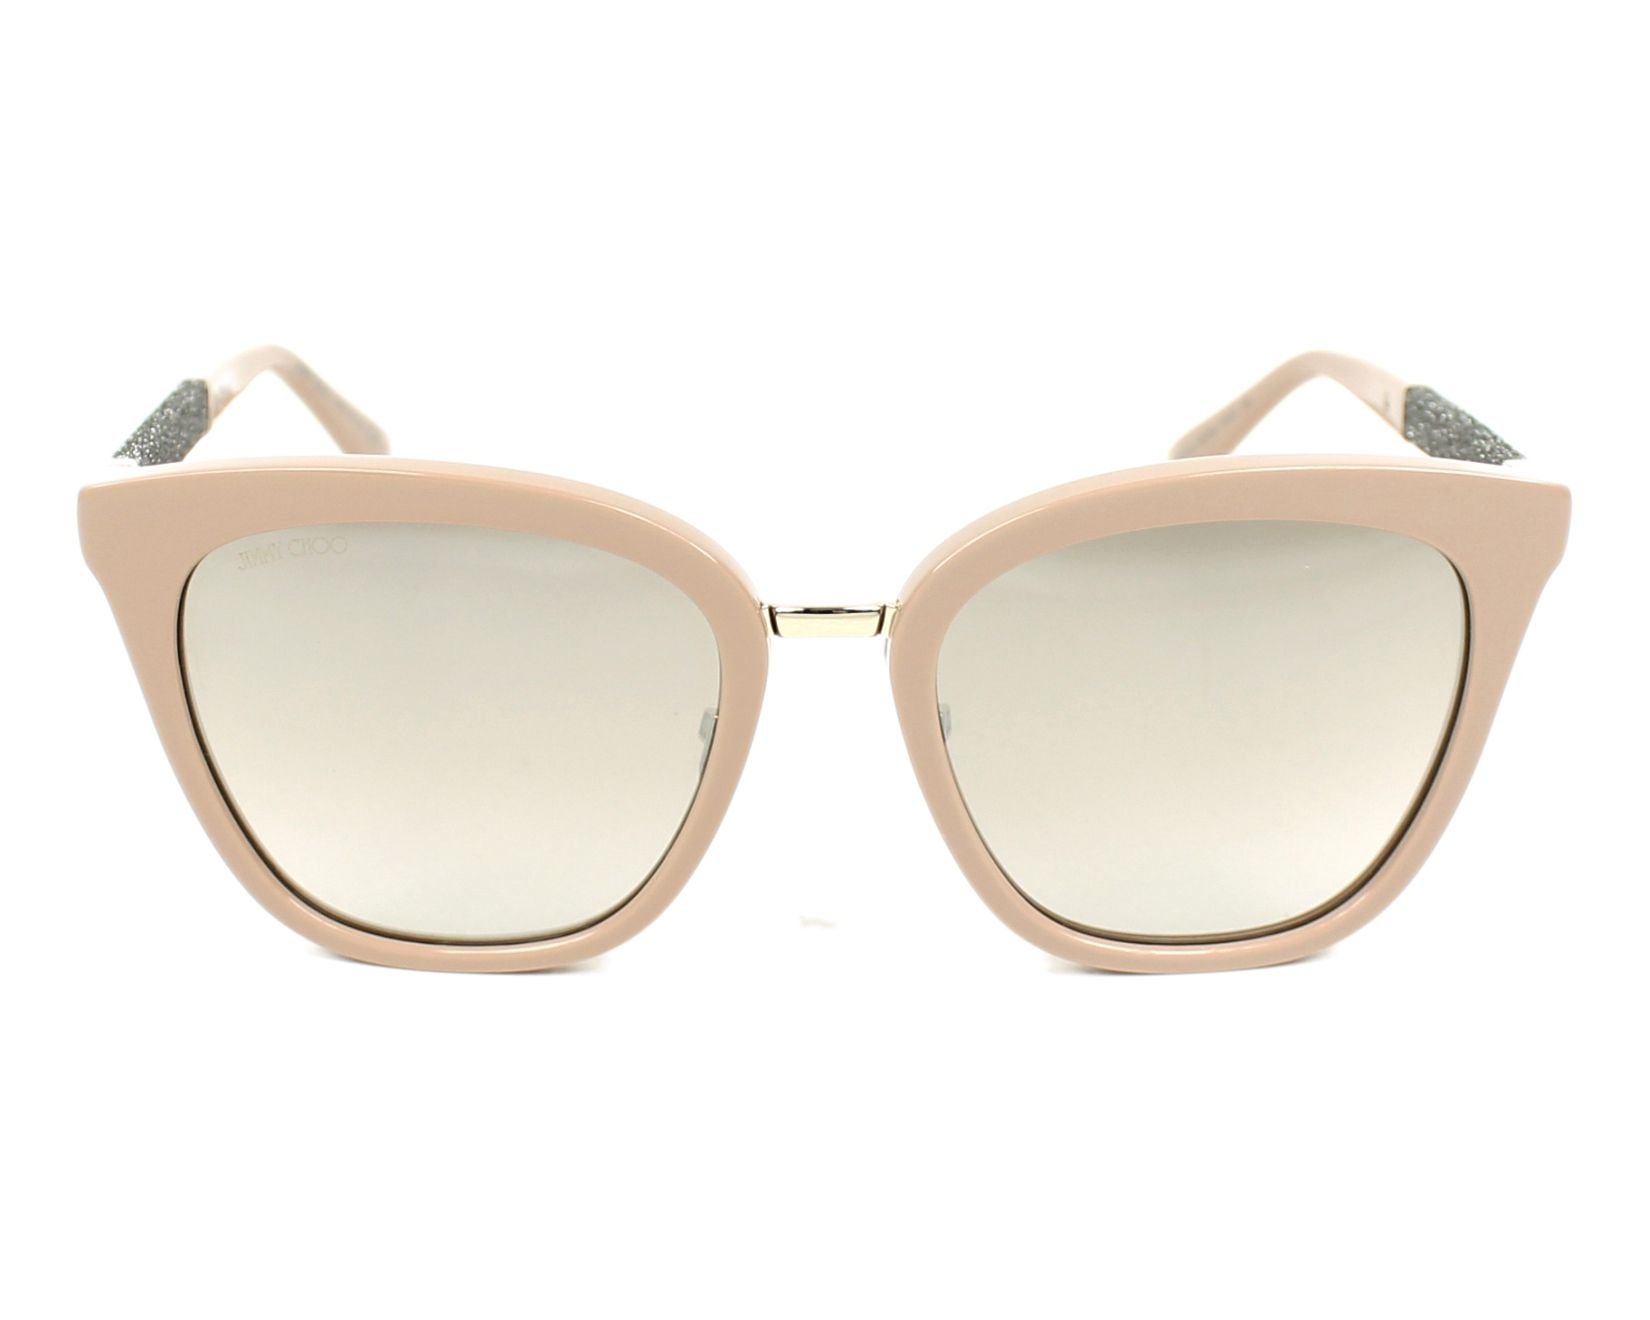 00fc10471e5 thumbnail Sunglasses Jimmy Choo FABRY-S KDZ NQ - Beige Silver front view